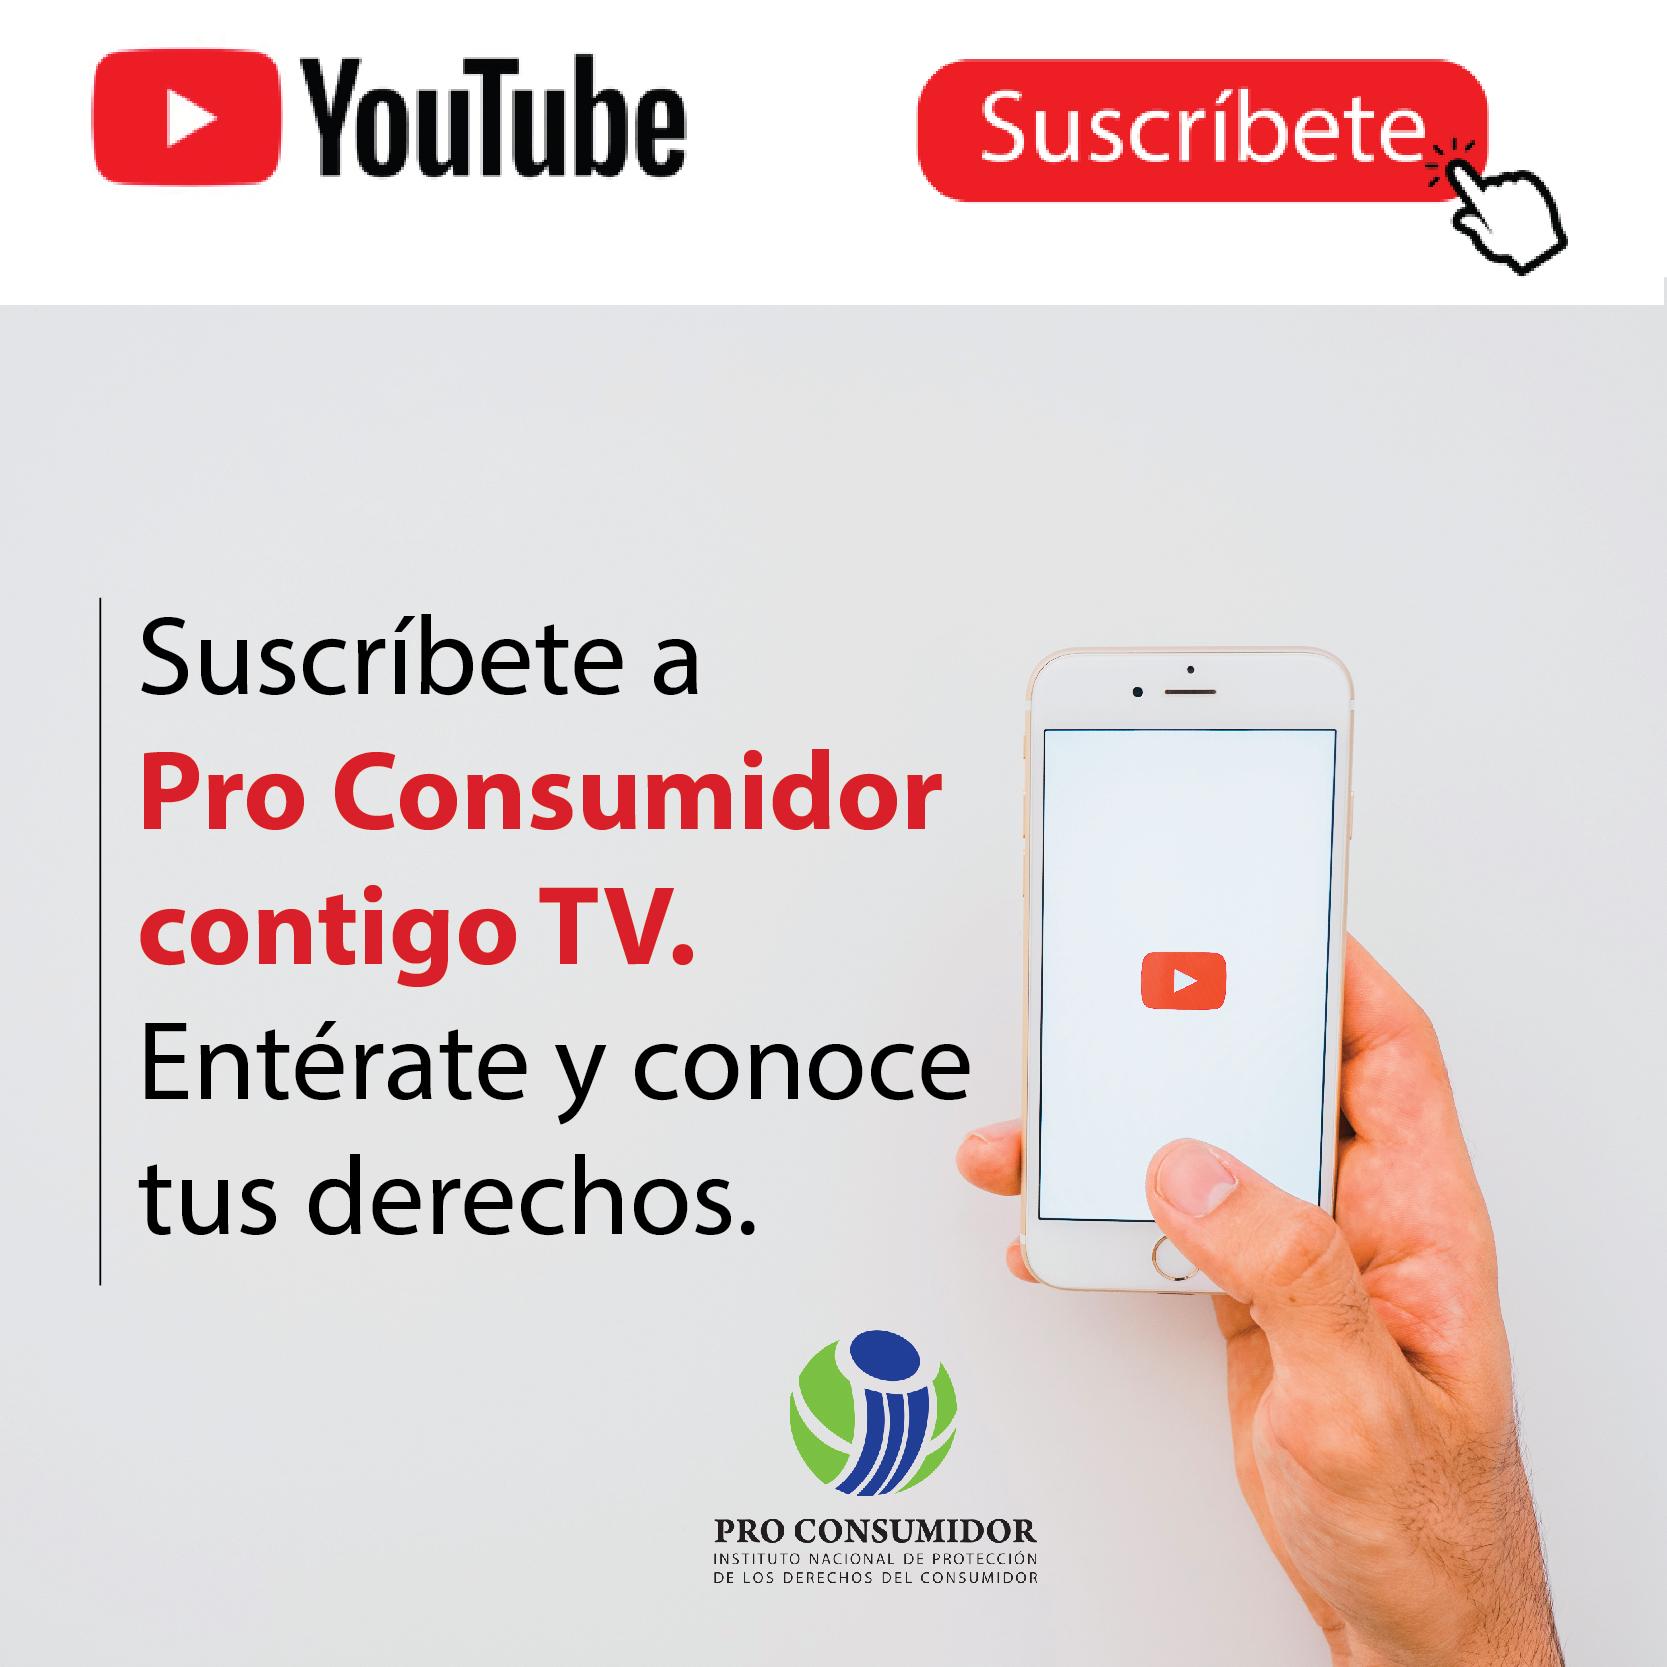 Proconsumidor Contigo TV